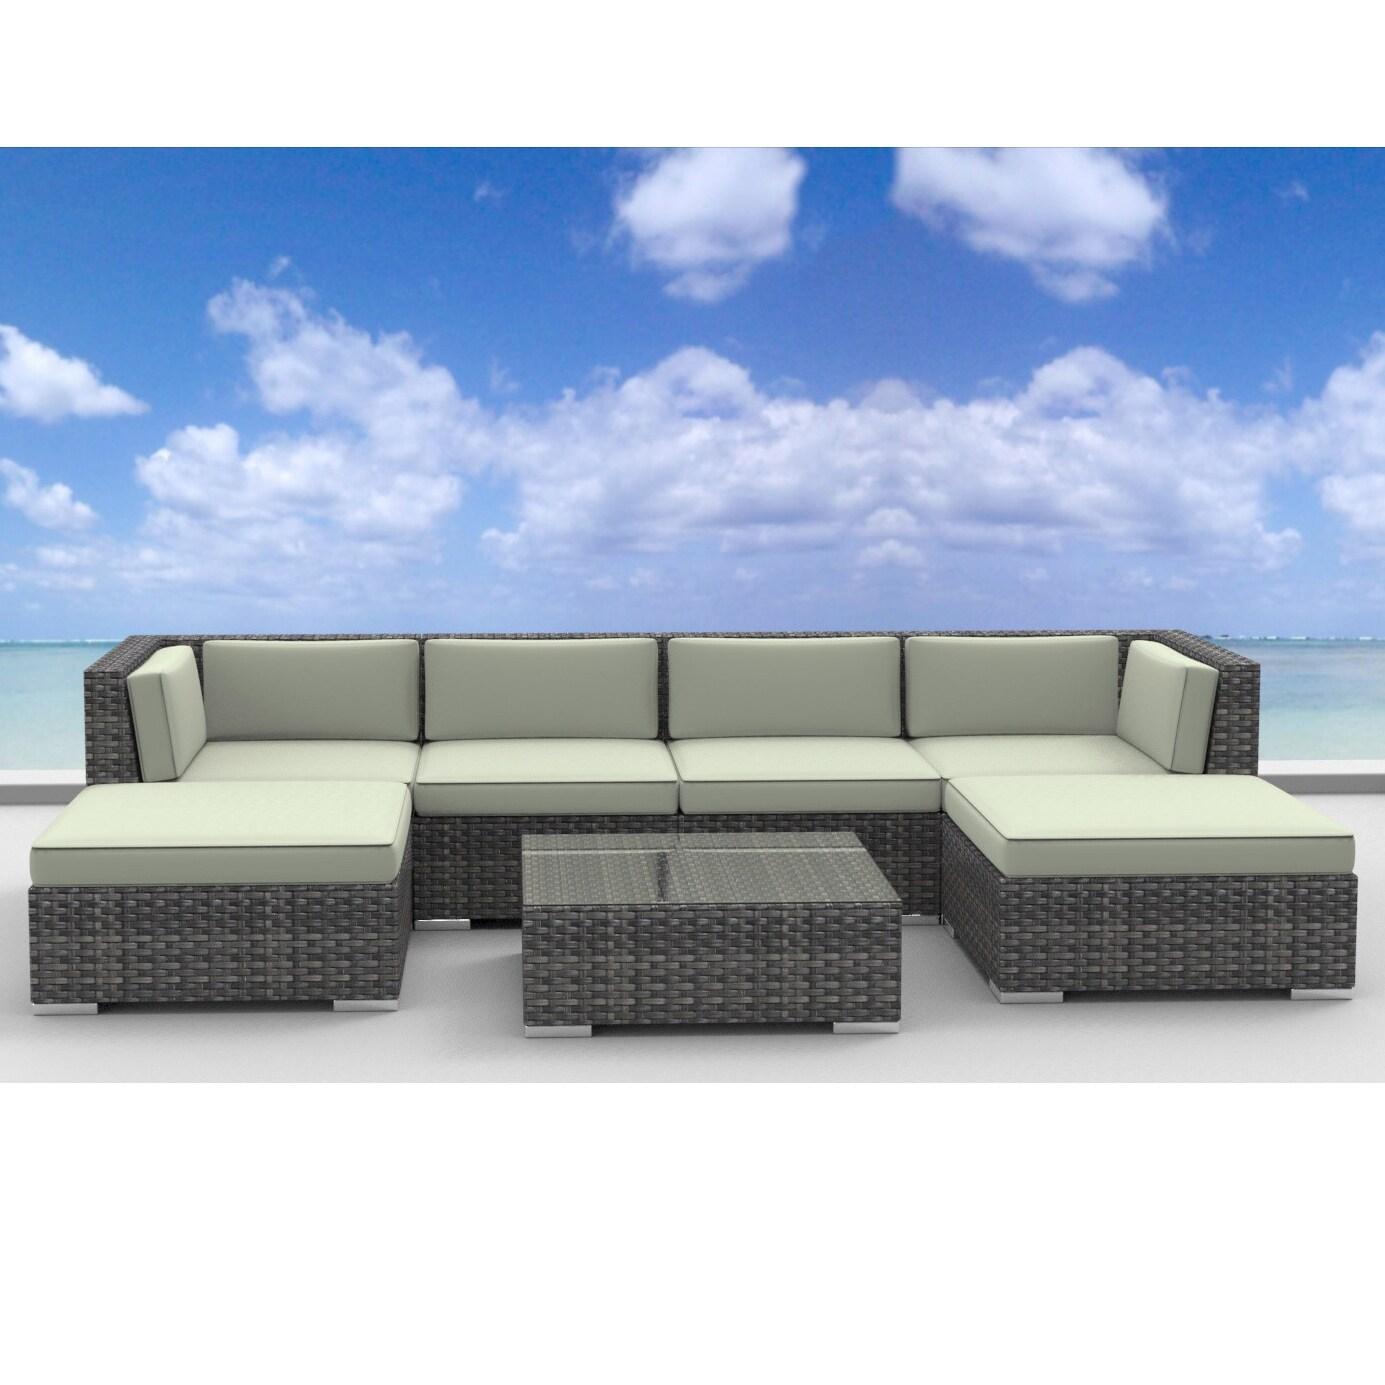 Patio Furniture 7 Piece Set urban furnishing maui rattan 7-piece outdoor sectional sofa patio